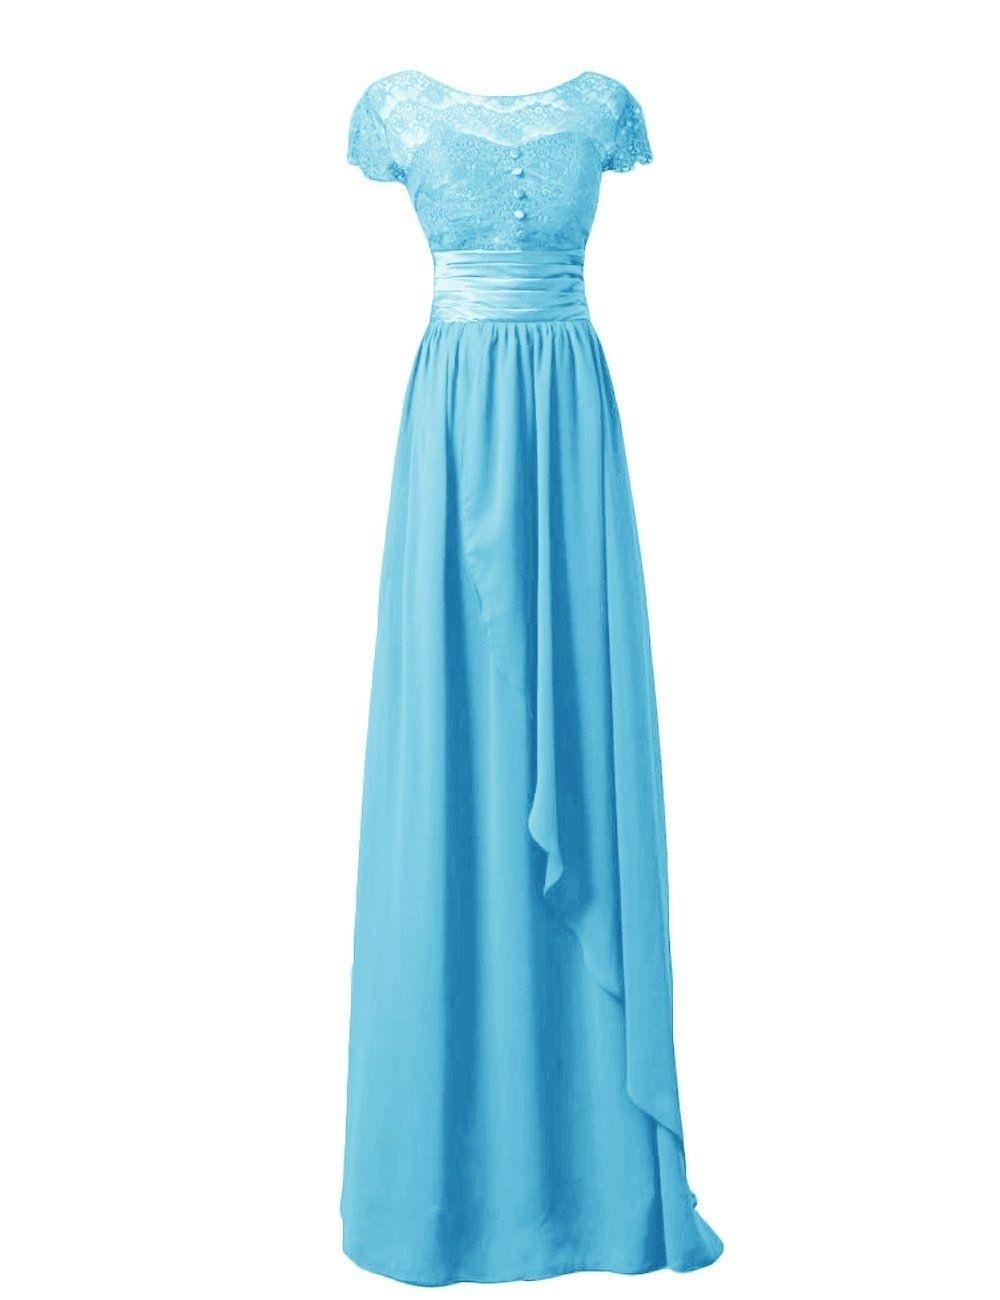 10 Spektakulär Kleid Lang Festlich VertriebFormal Luxus Kleid Lang Festlich Ärmel